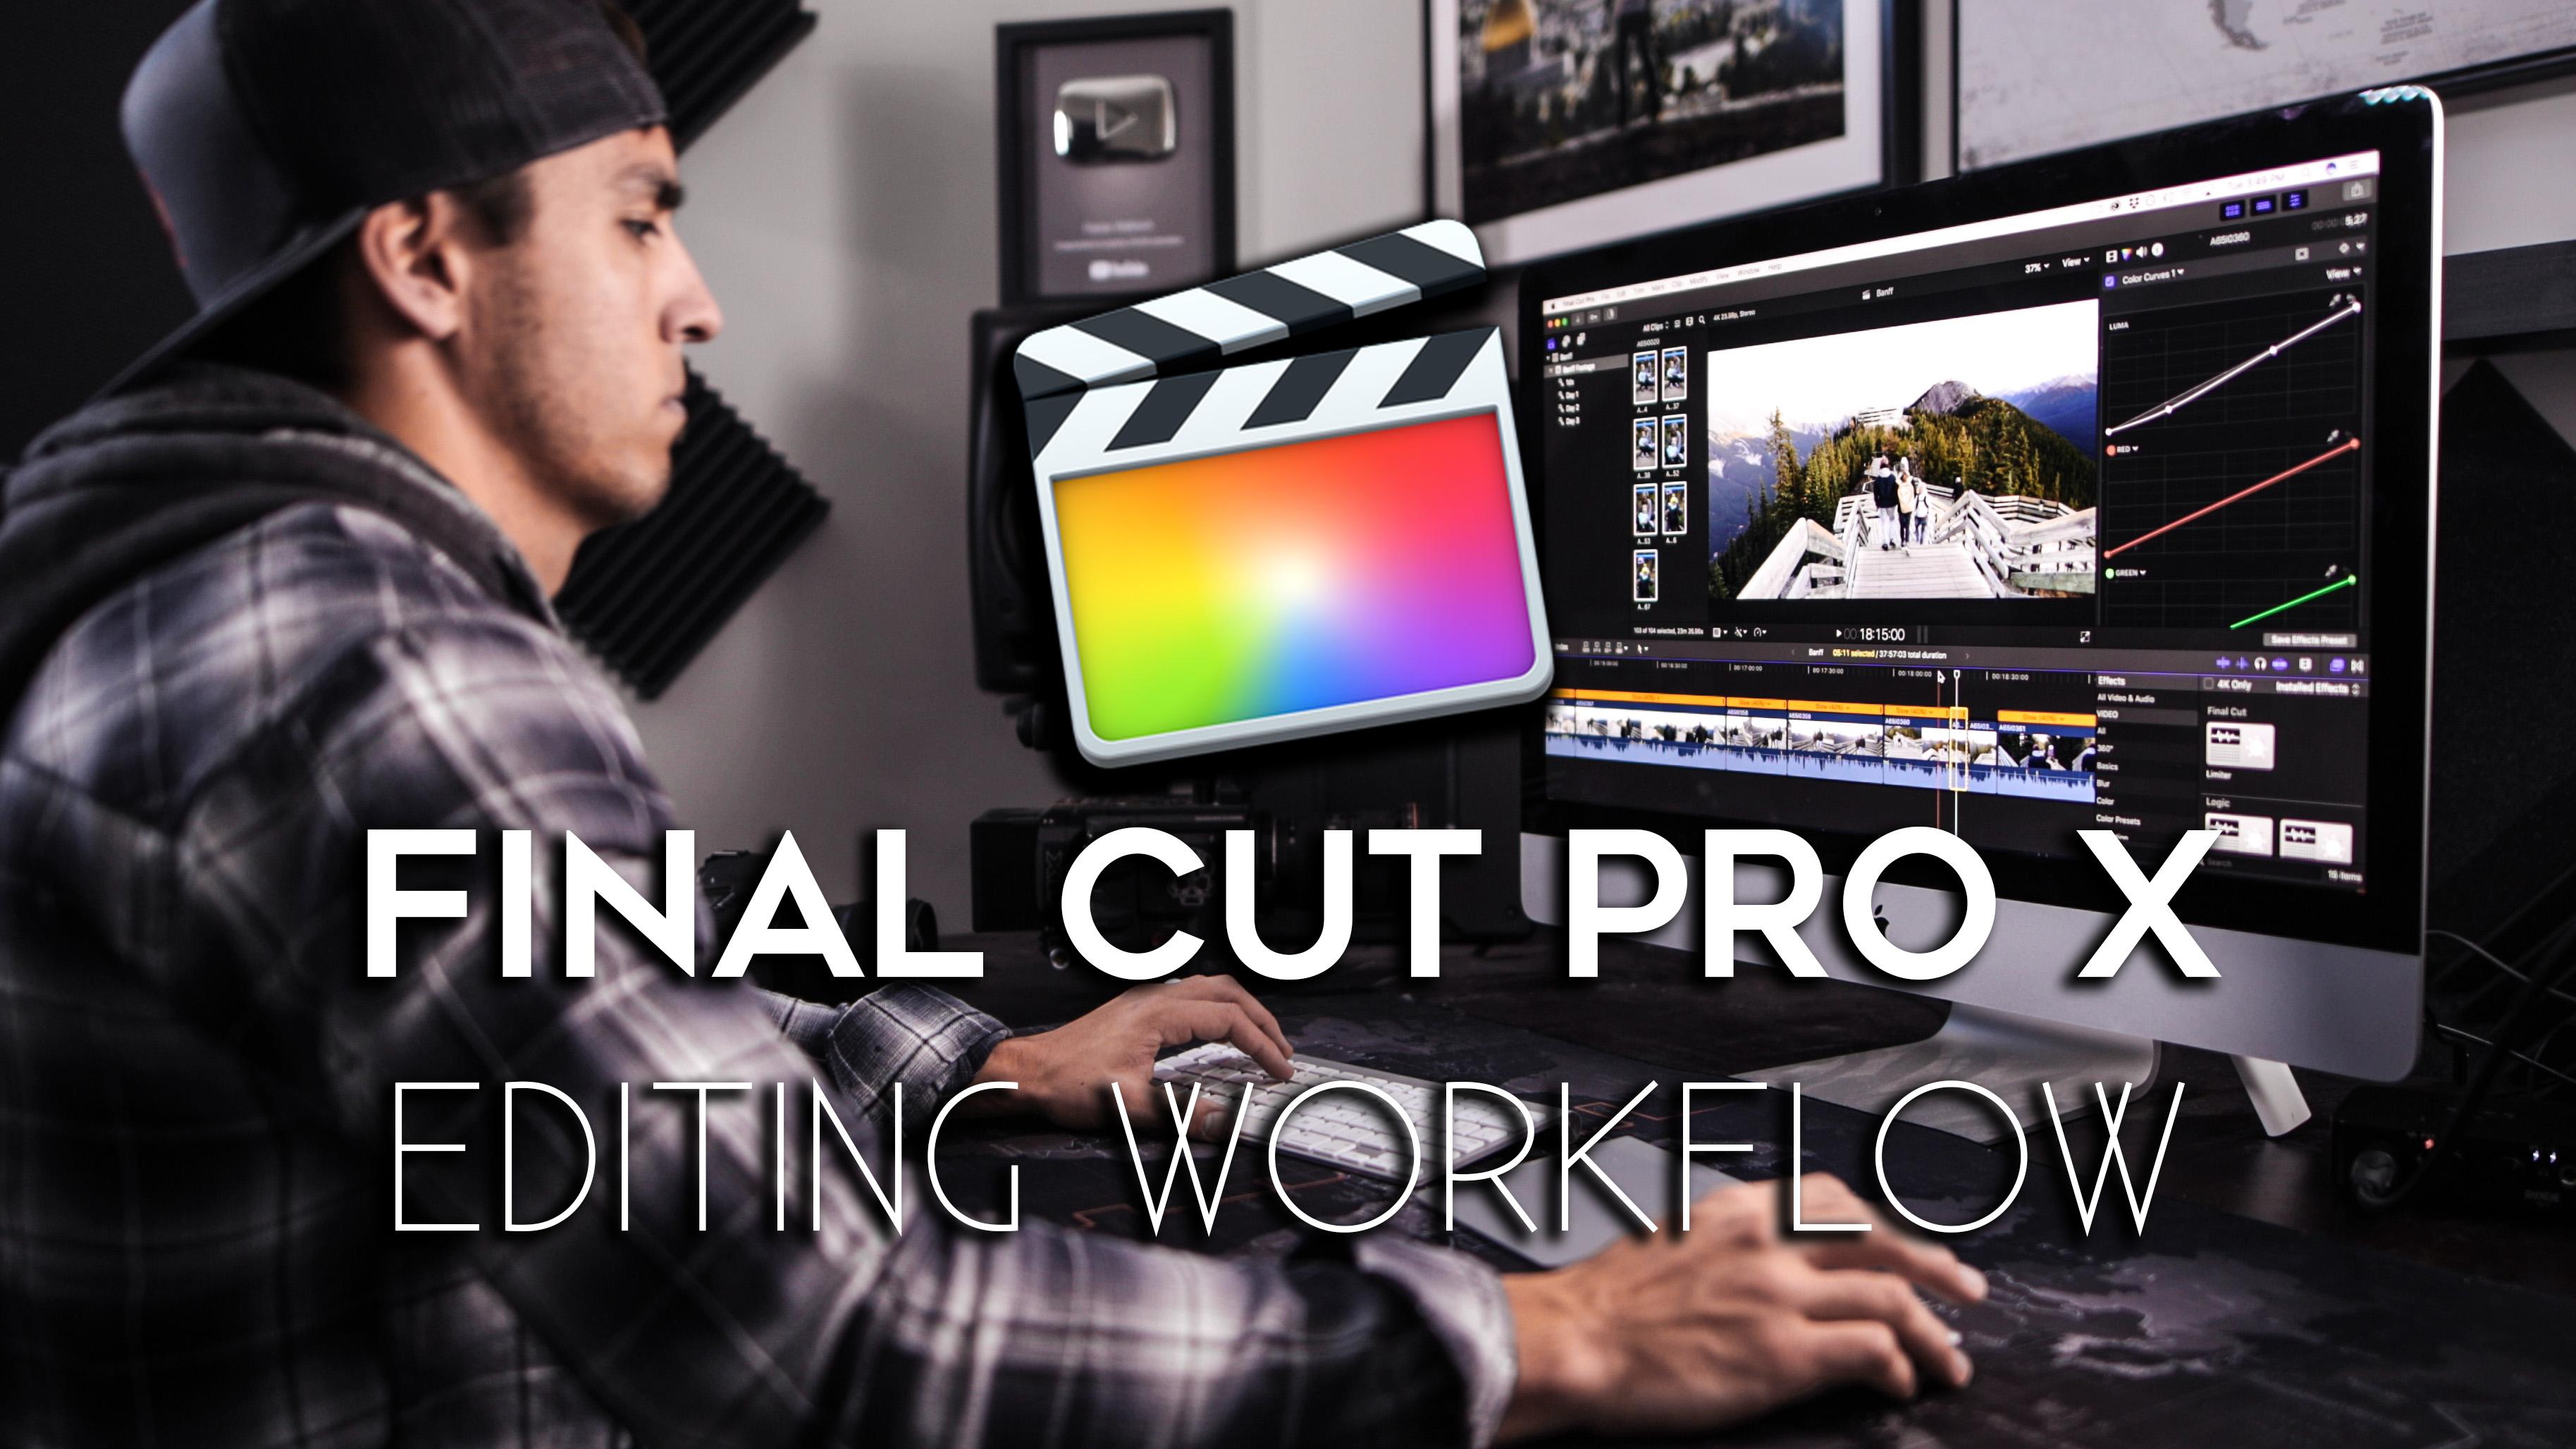 Final Cut Pro X Editing Workflow | Full Time Filmmaker